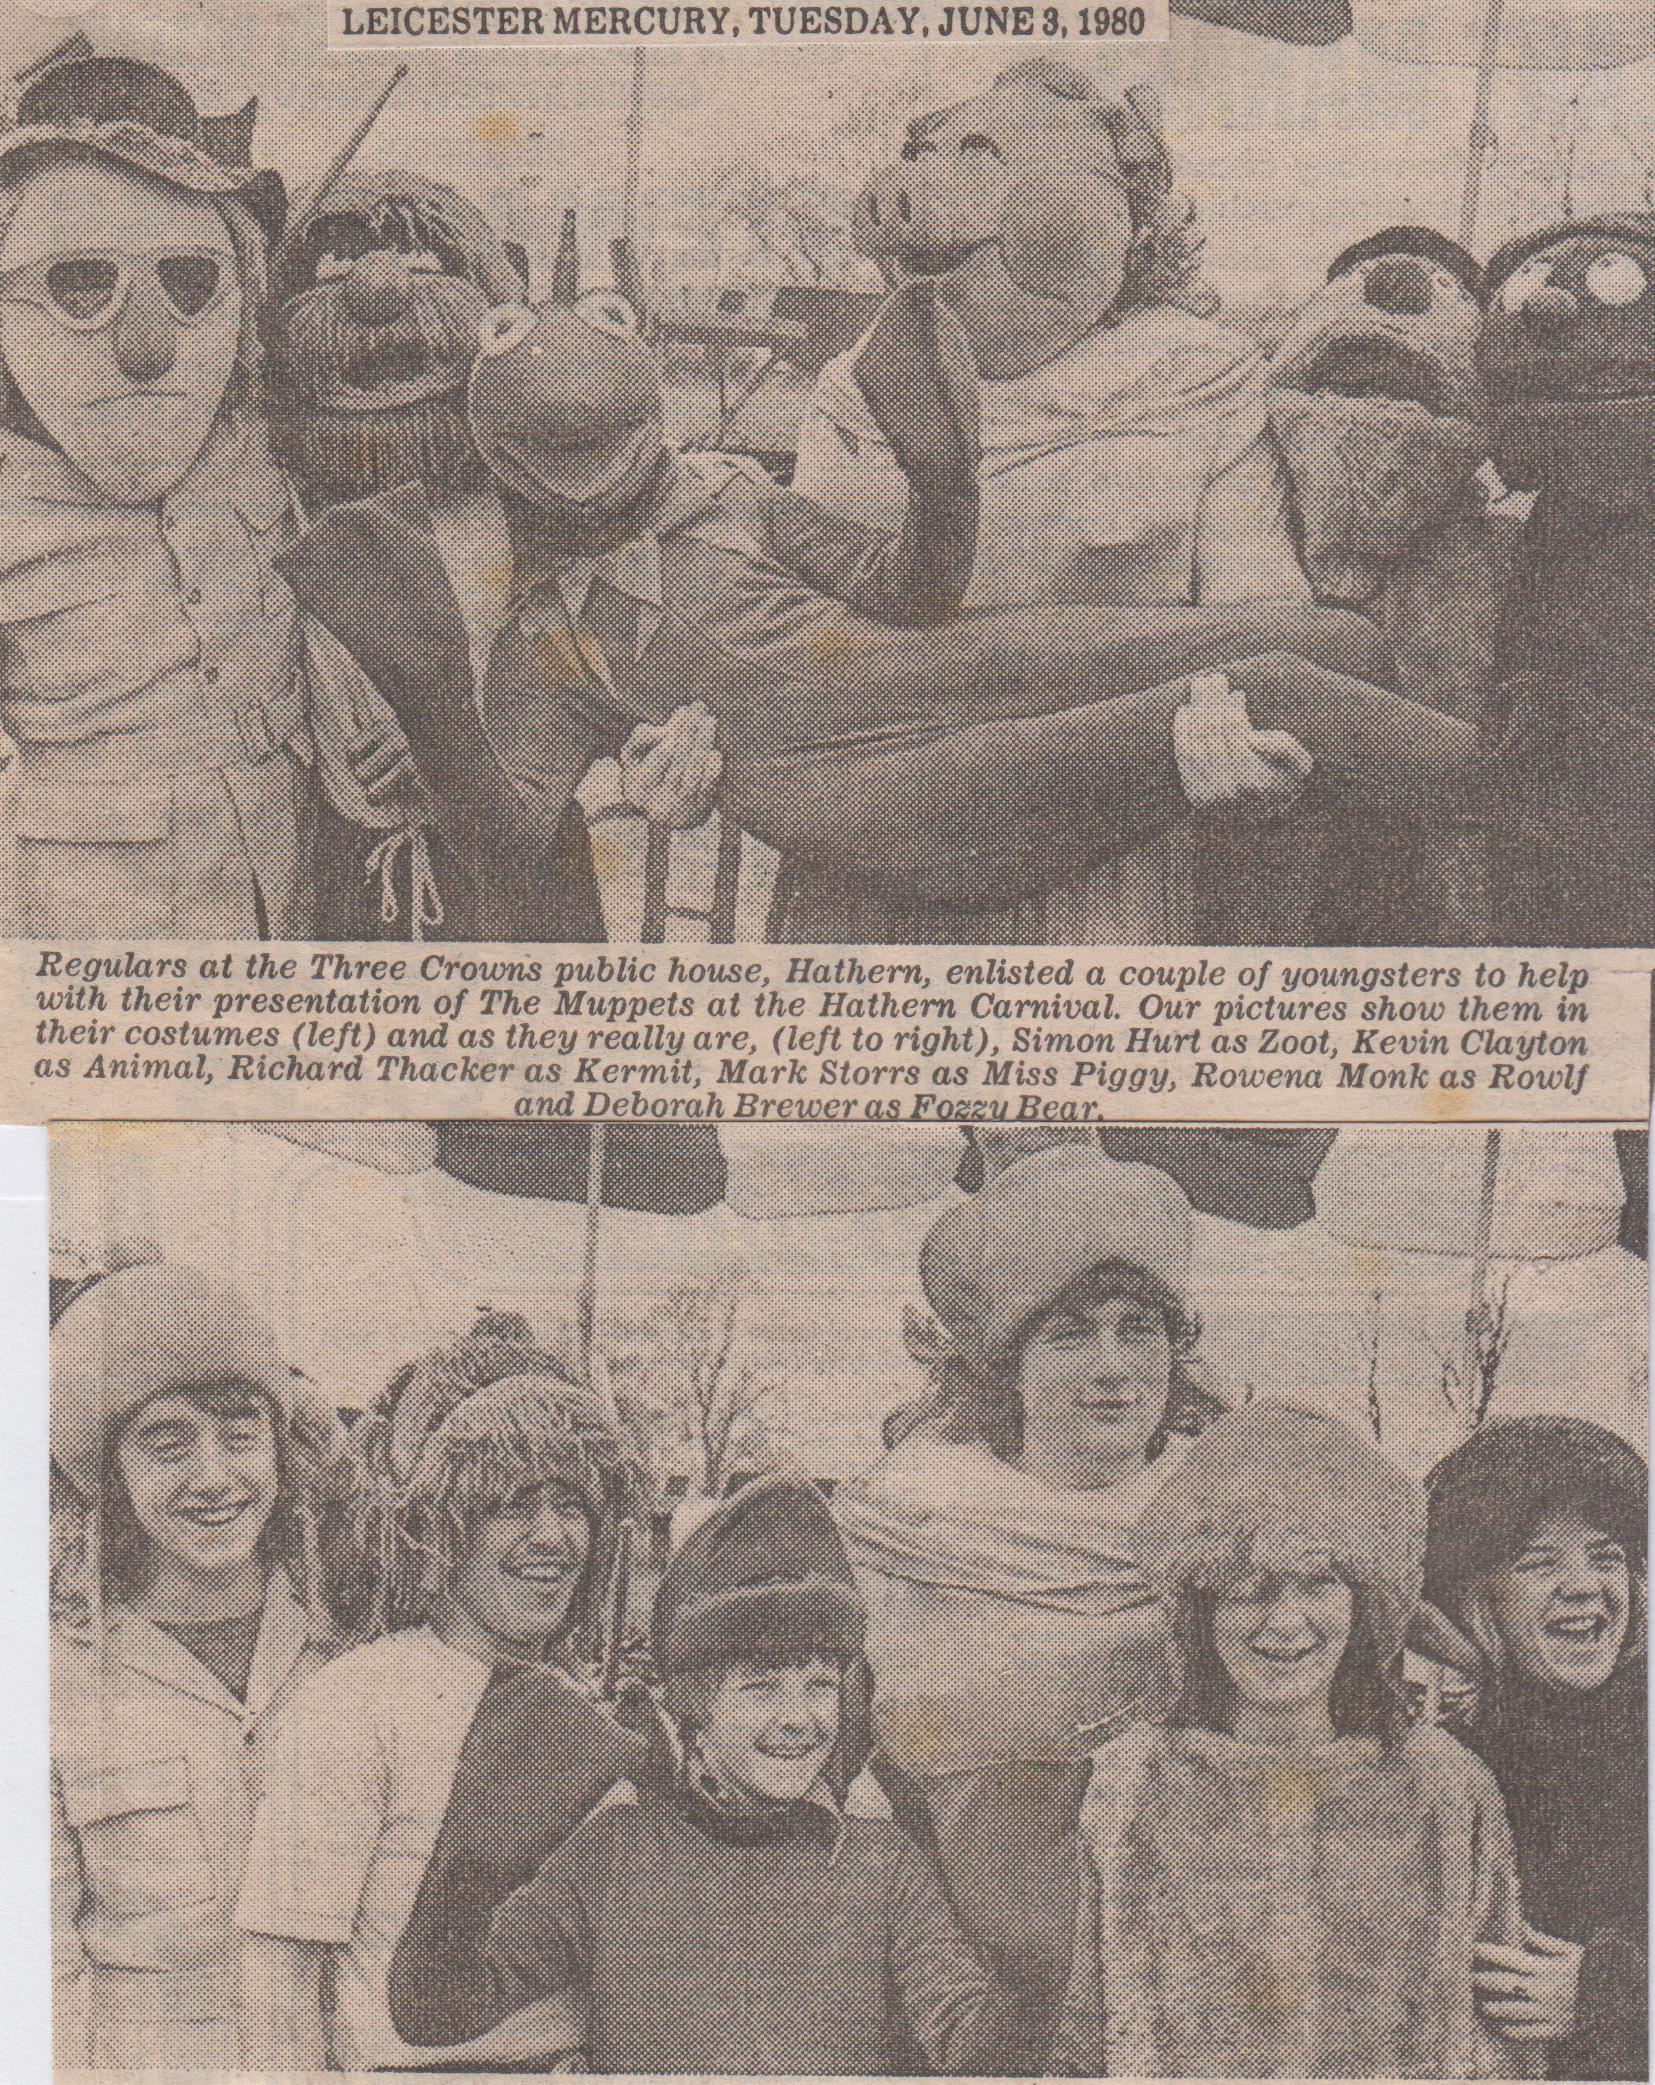 muppets_1980_001.jpg